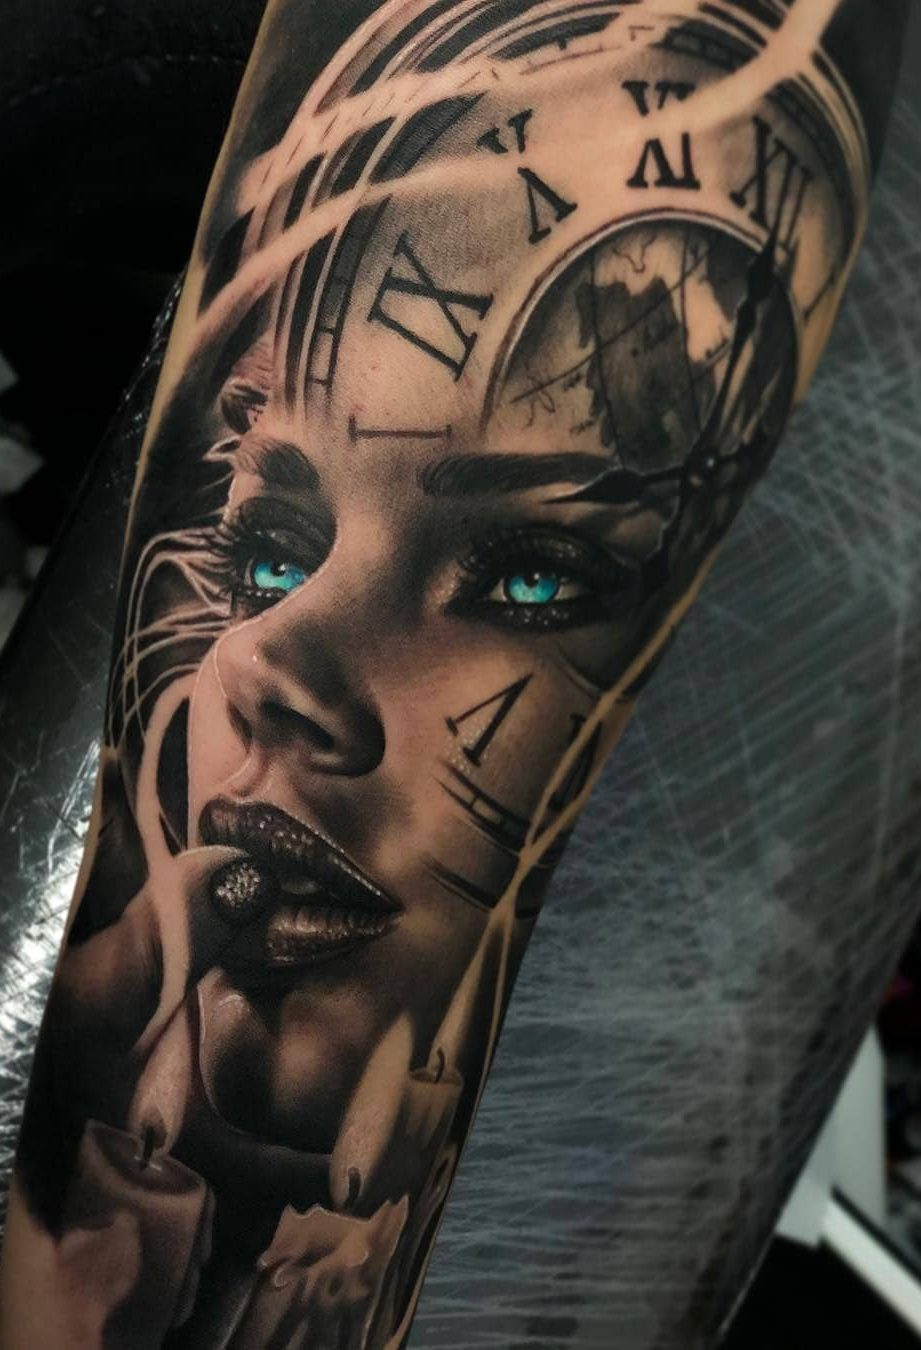 mazing tattoo